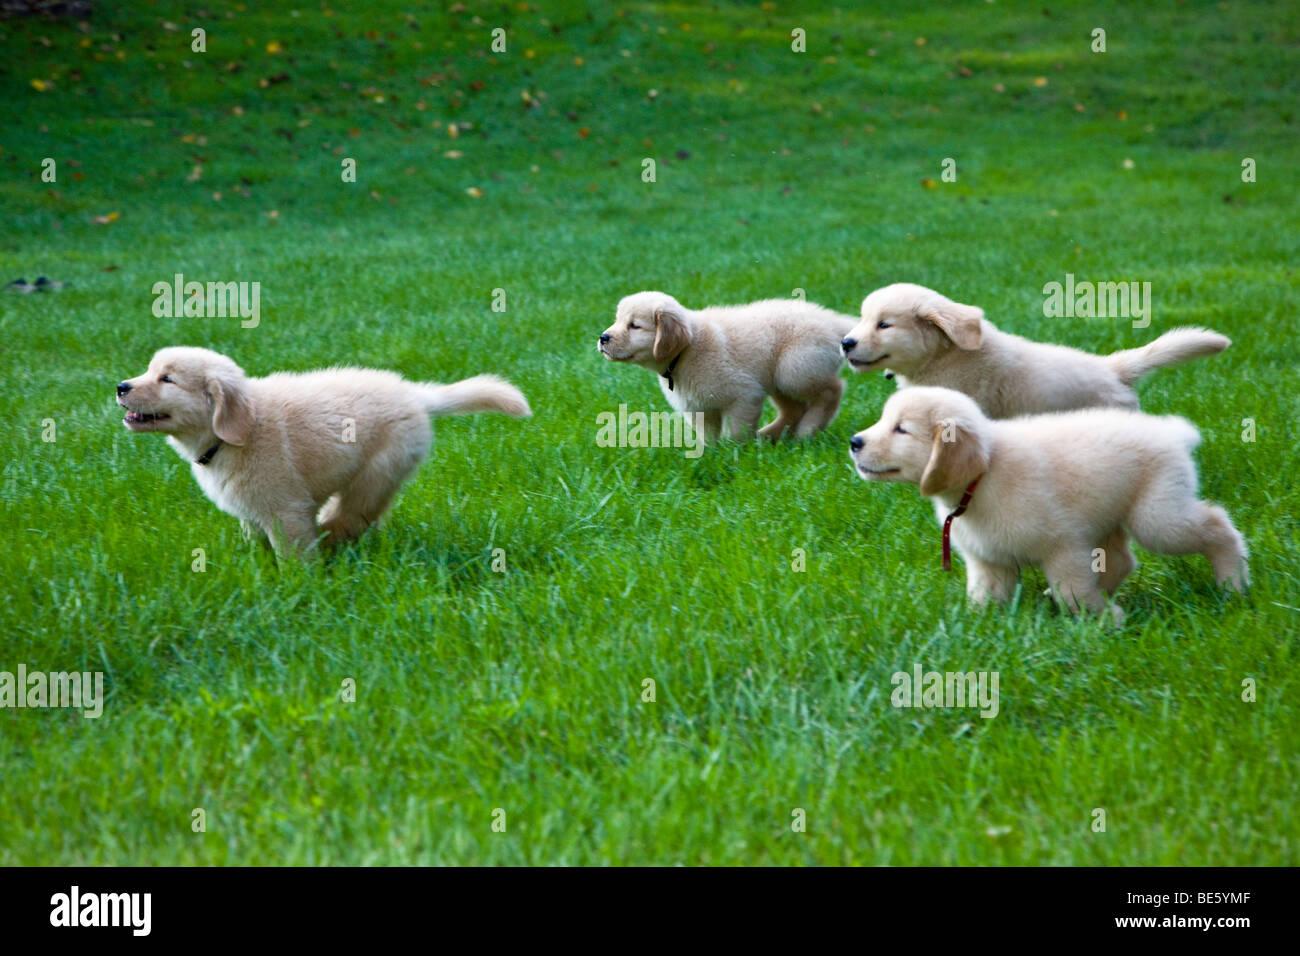 Eight Week Old Golden Retriever Puppies Running On The Grass Stock